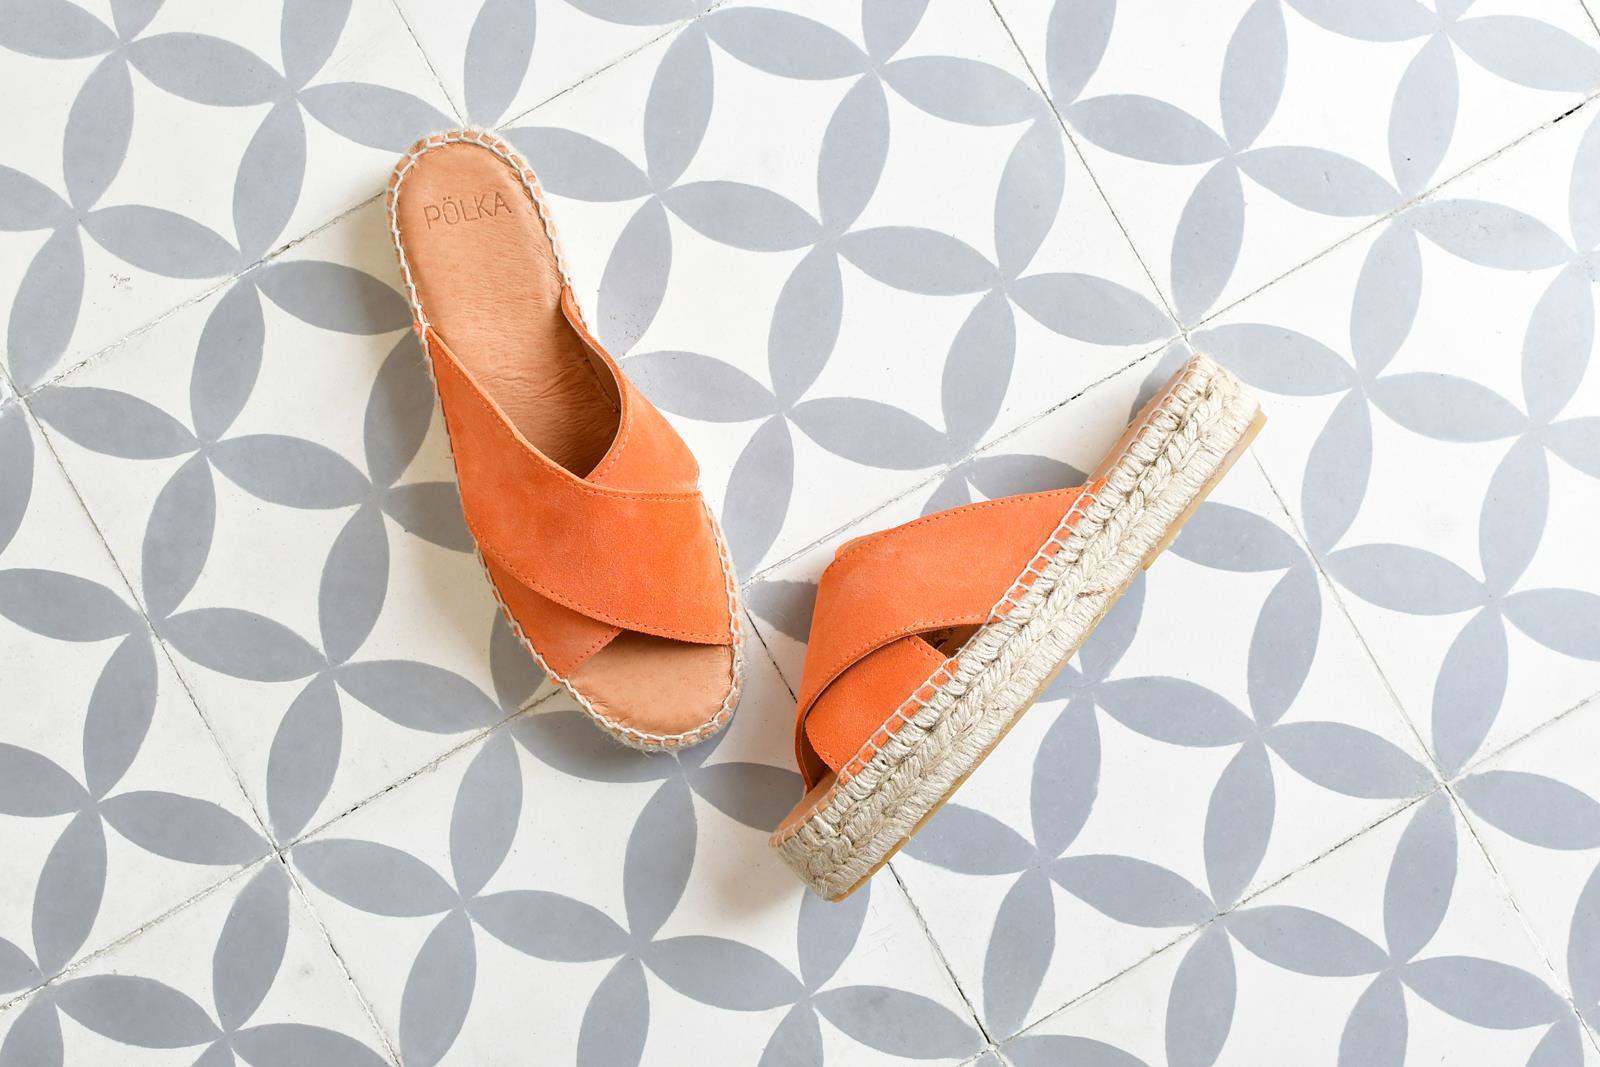 Sandalia Yute Serraje Pölka Shoes Kas Coral Plataforma 812P